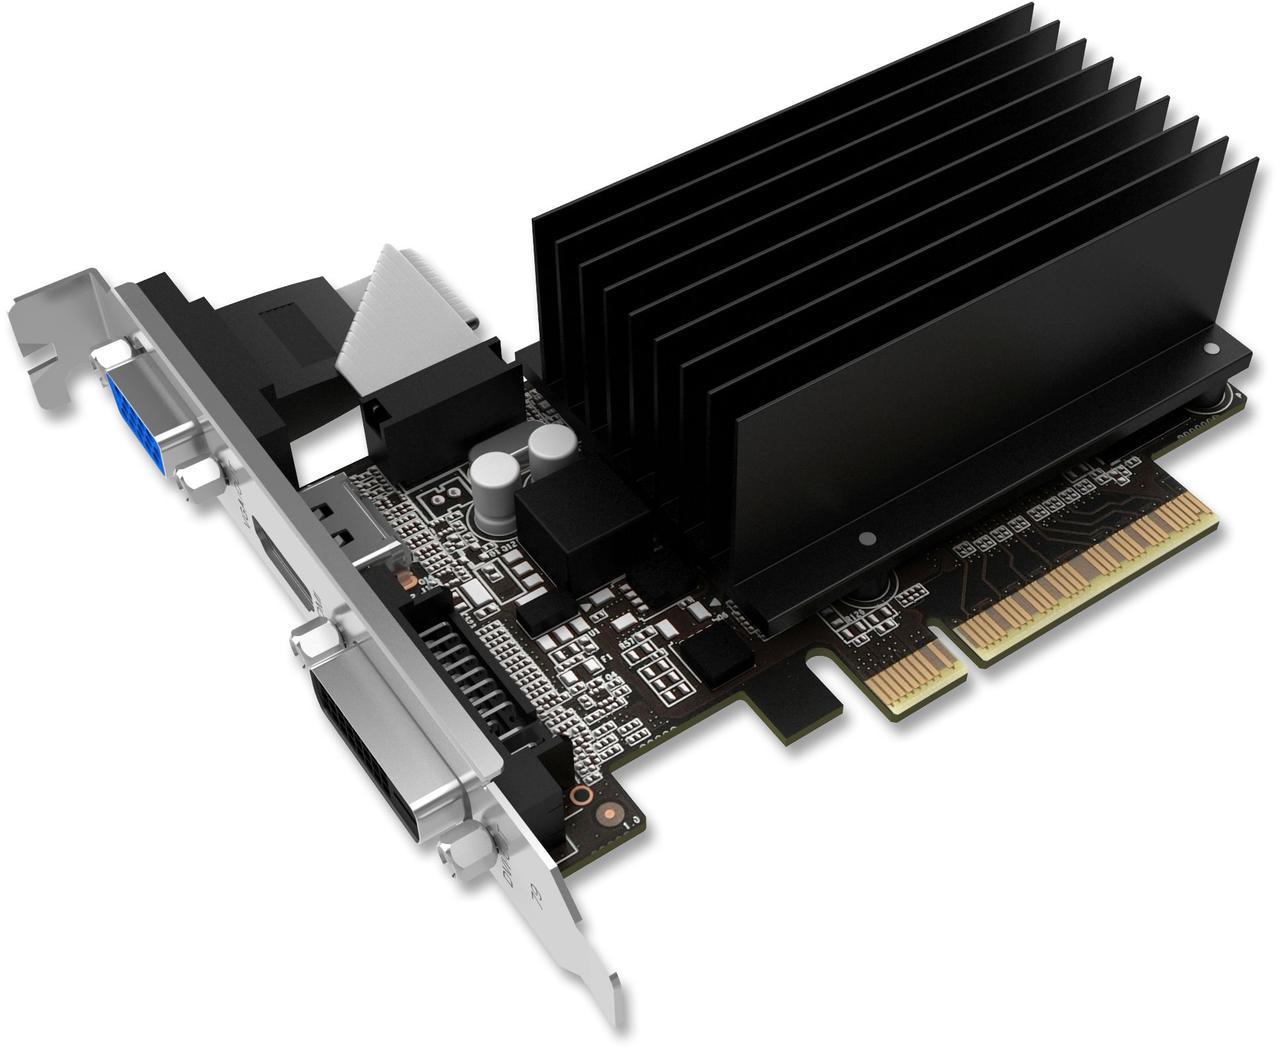 "Видеокарта Palit GeForce GT630 2GB DDR3 64bit (NEAT6300HD46-2080H) ""Over-Stock"" Б/У"